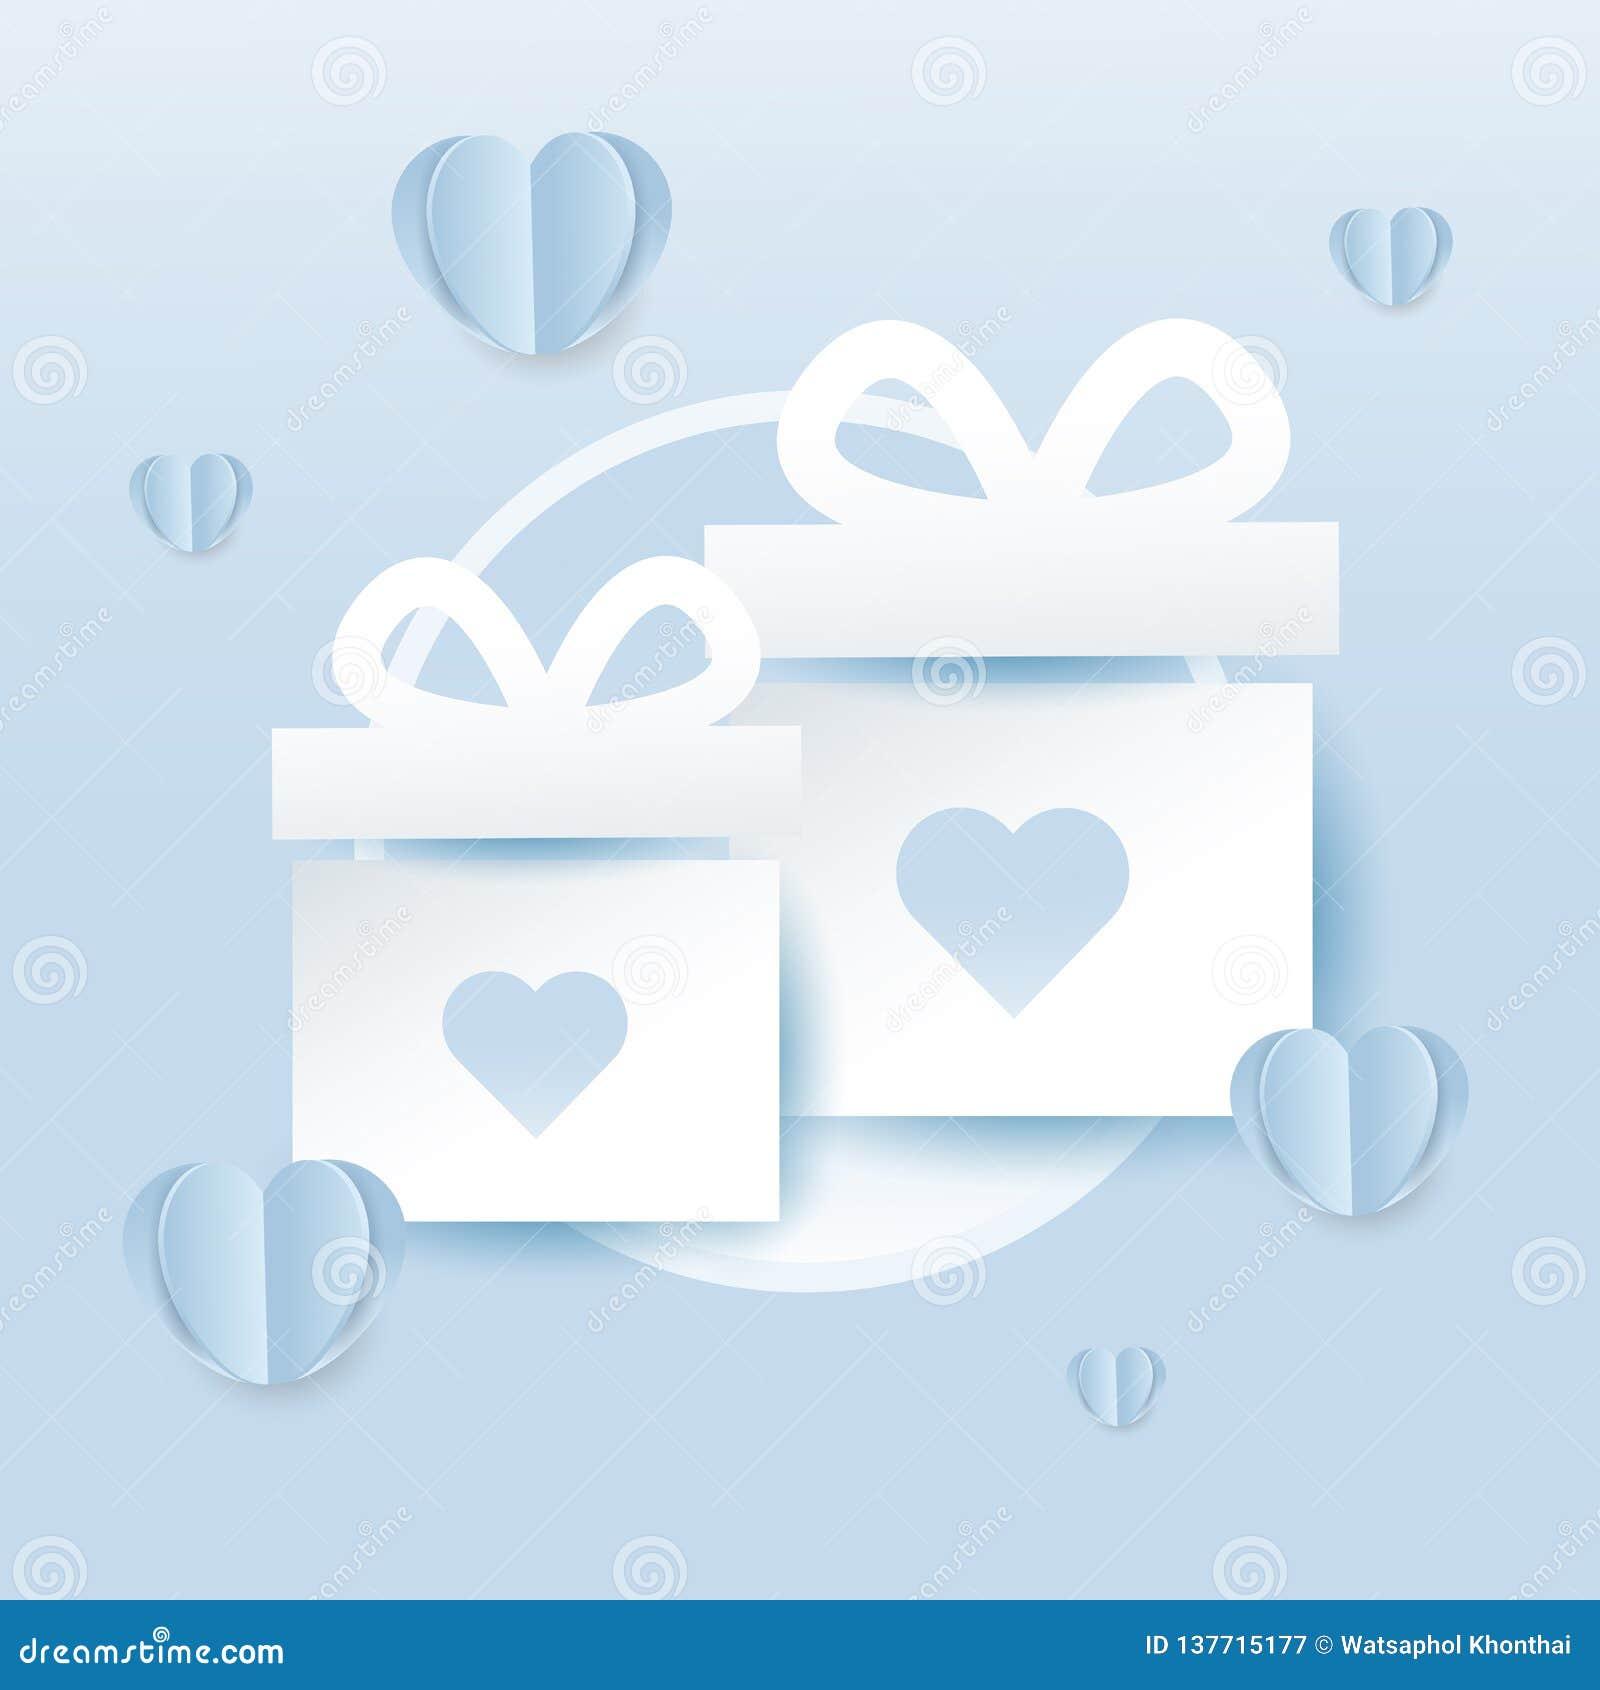 Valentines Gift Box Icon Design For Banner Or Invitation